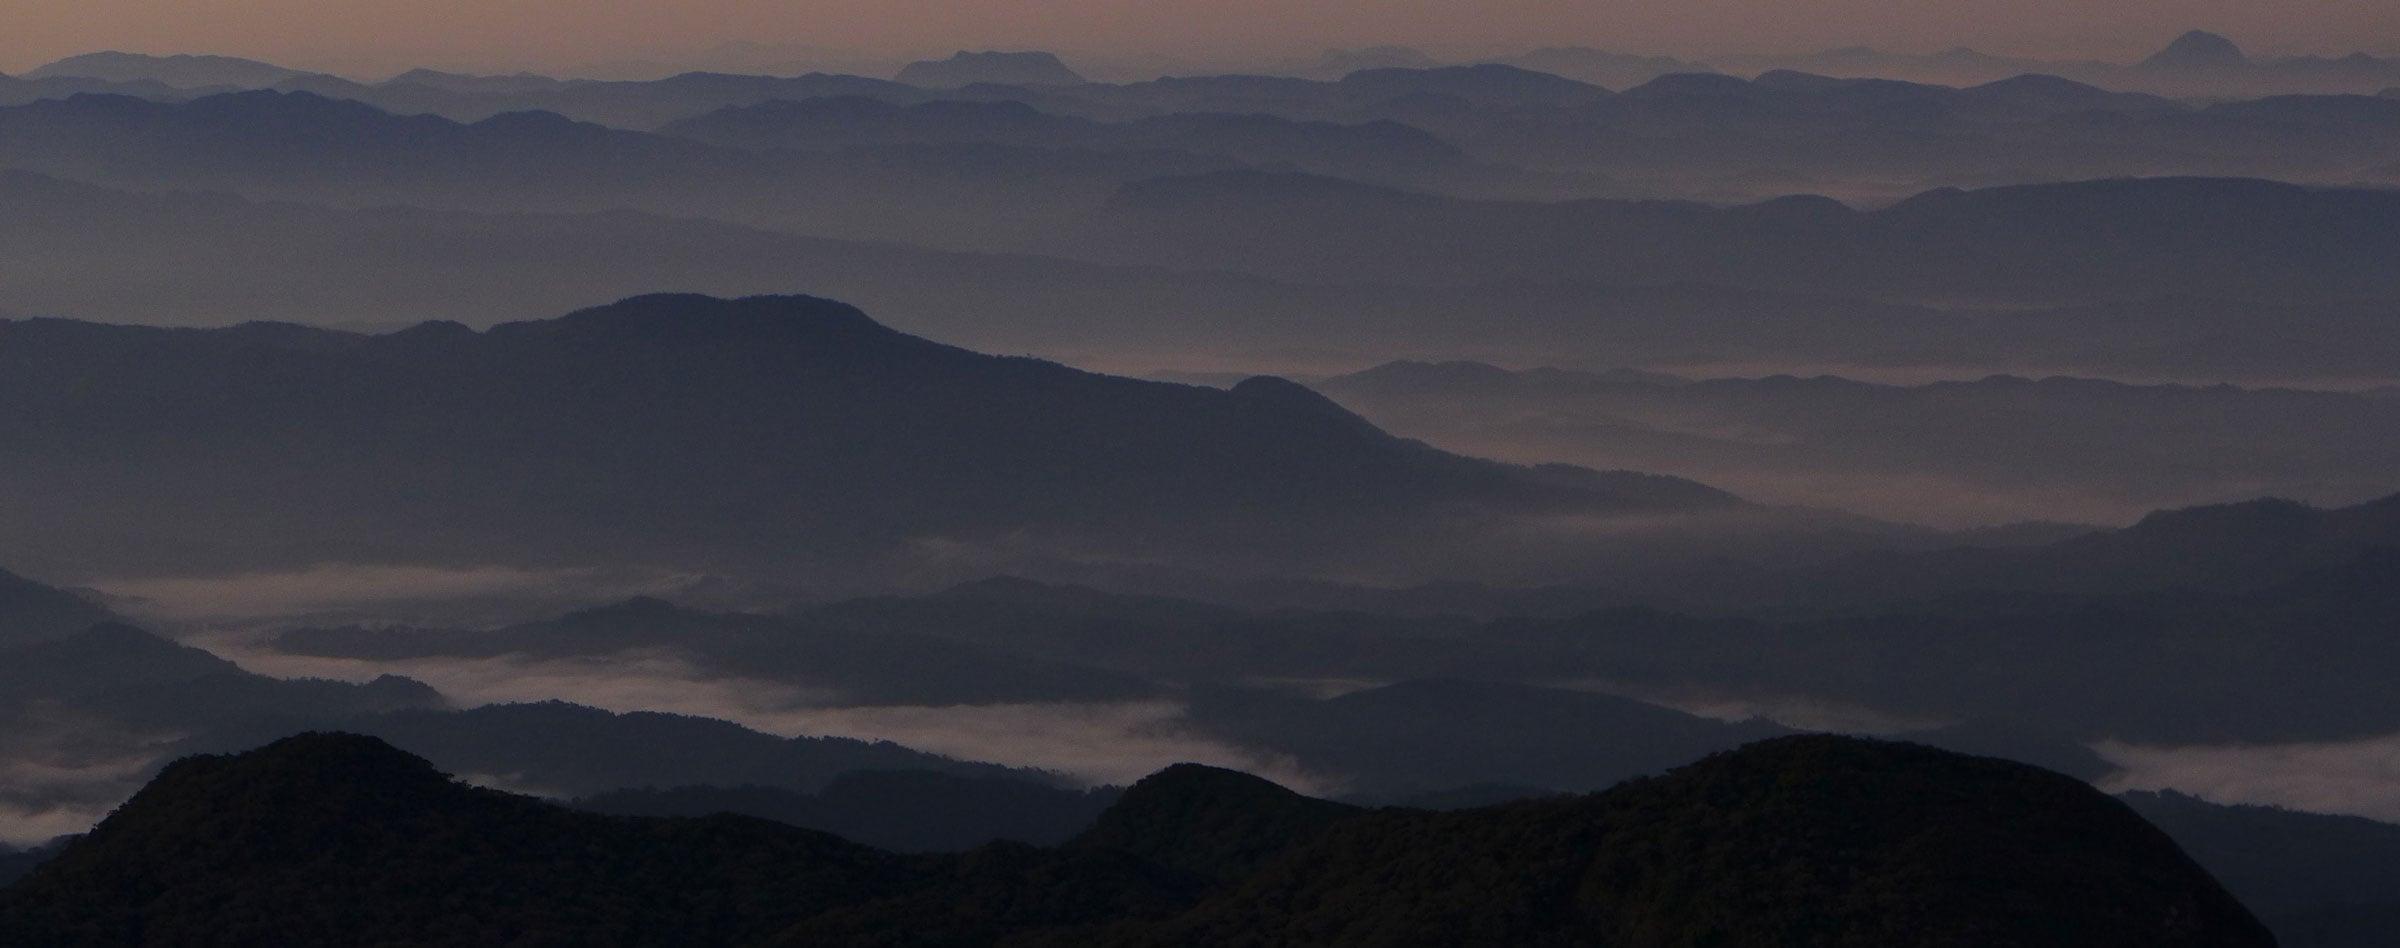 shaded-hills-crop.jpg